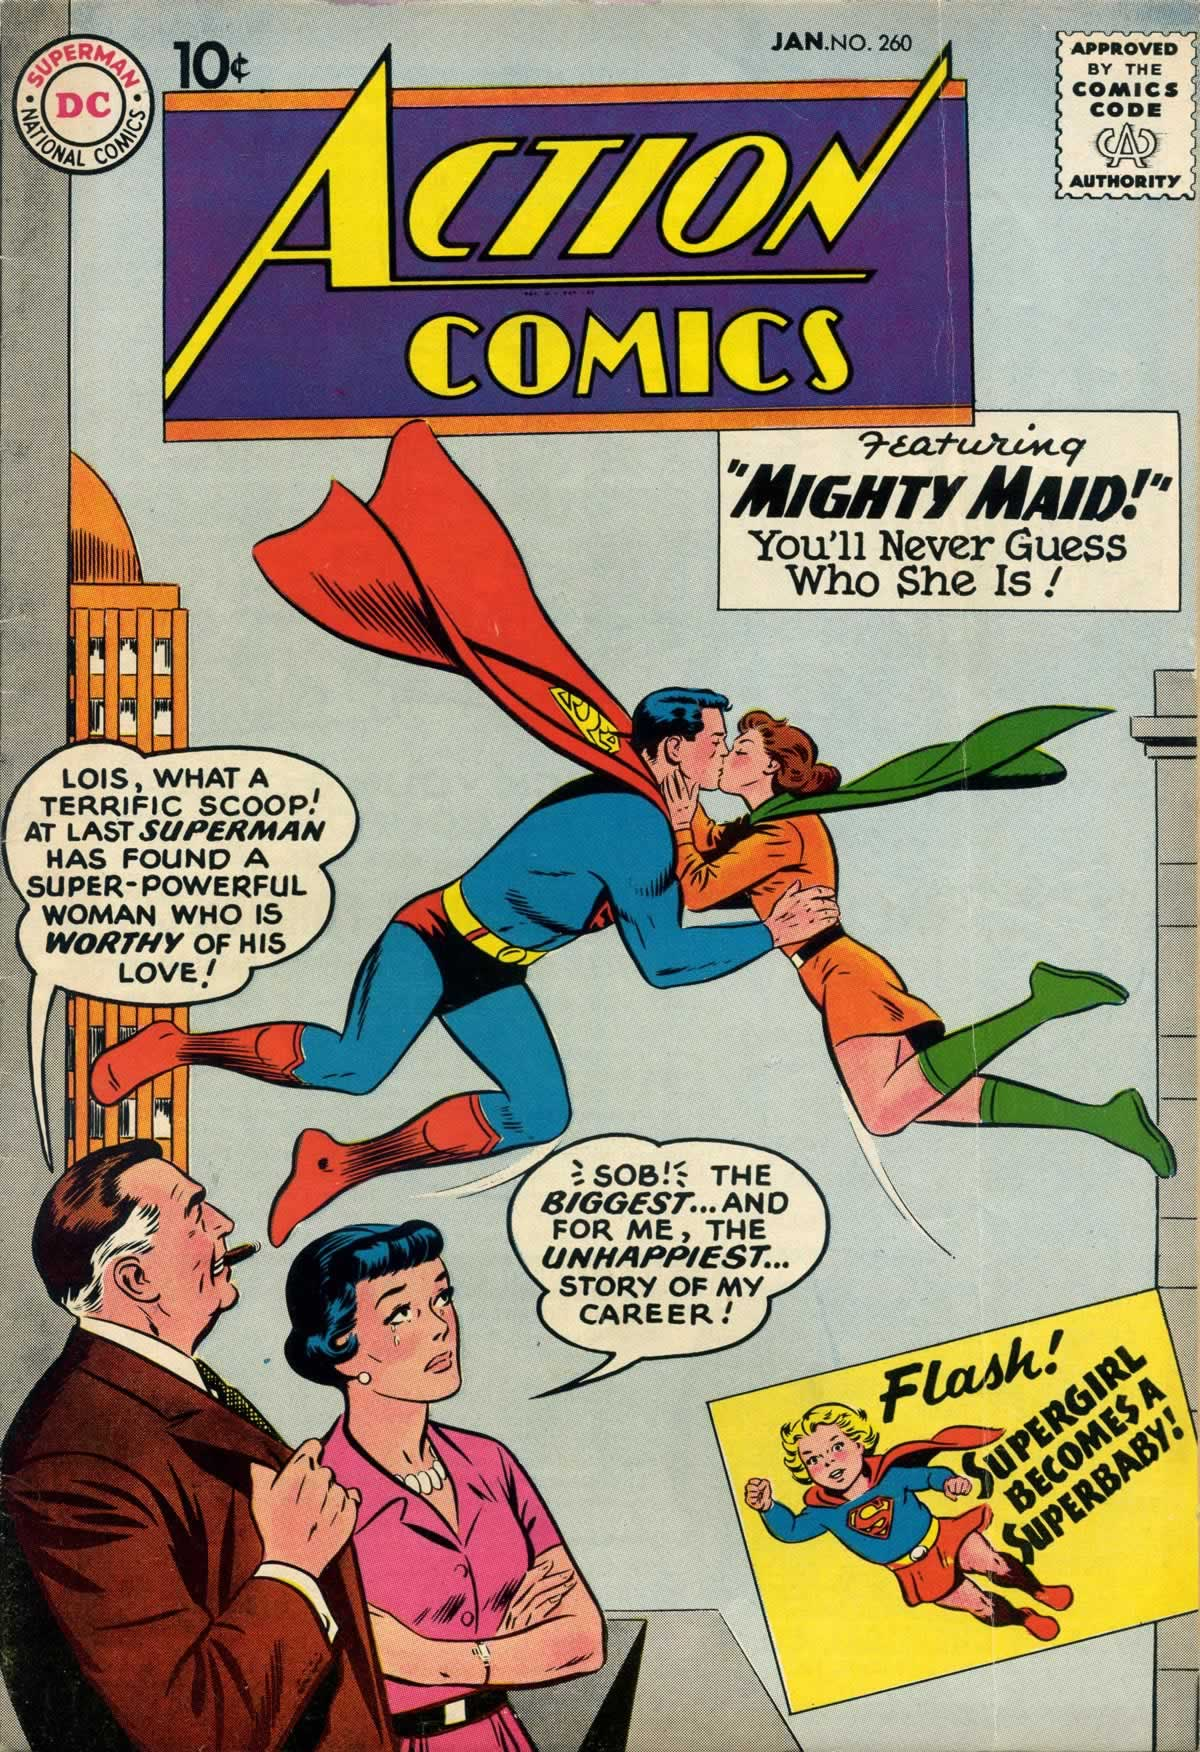 Action Comics (1938) 260 Page 1